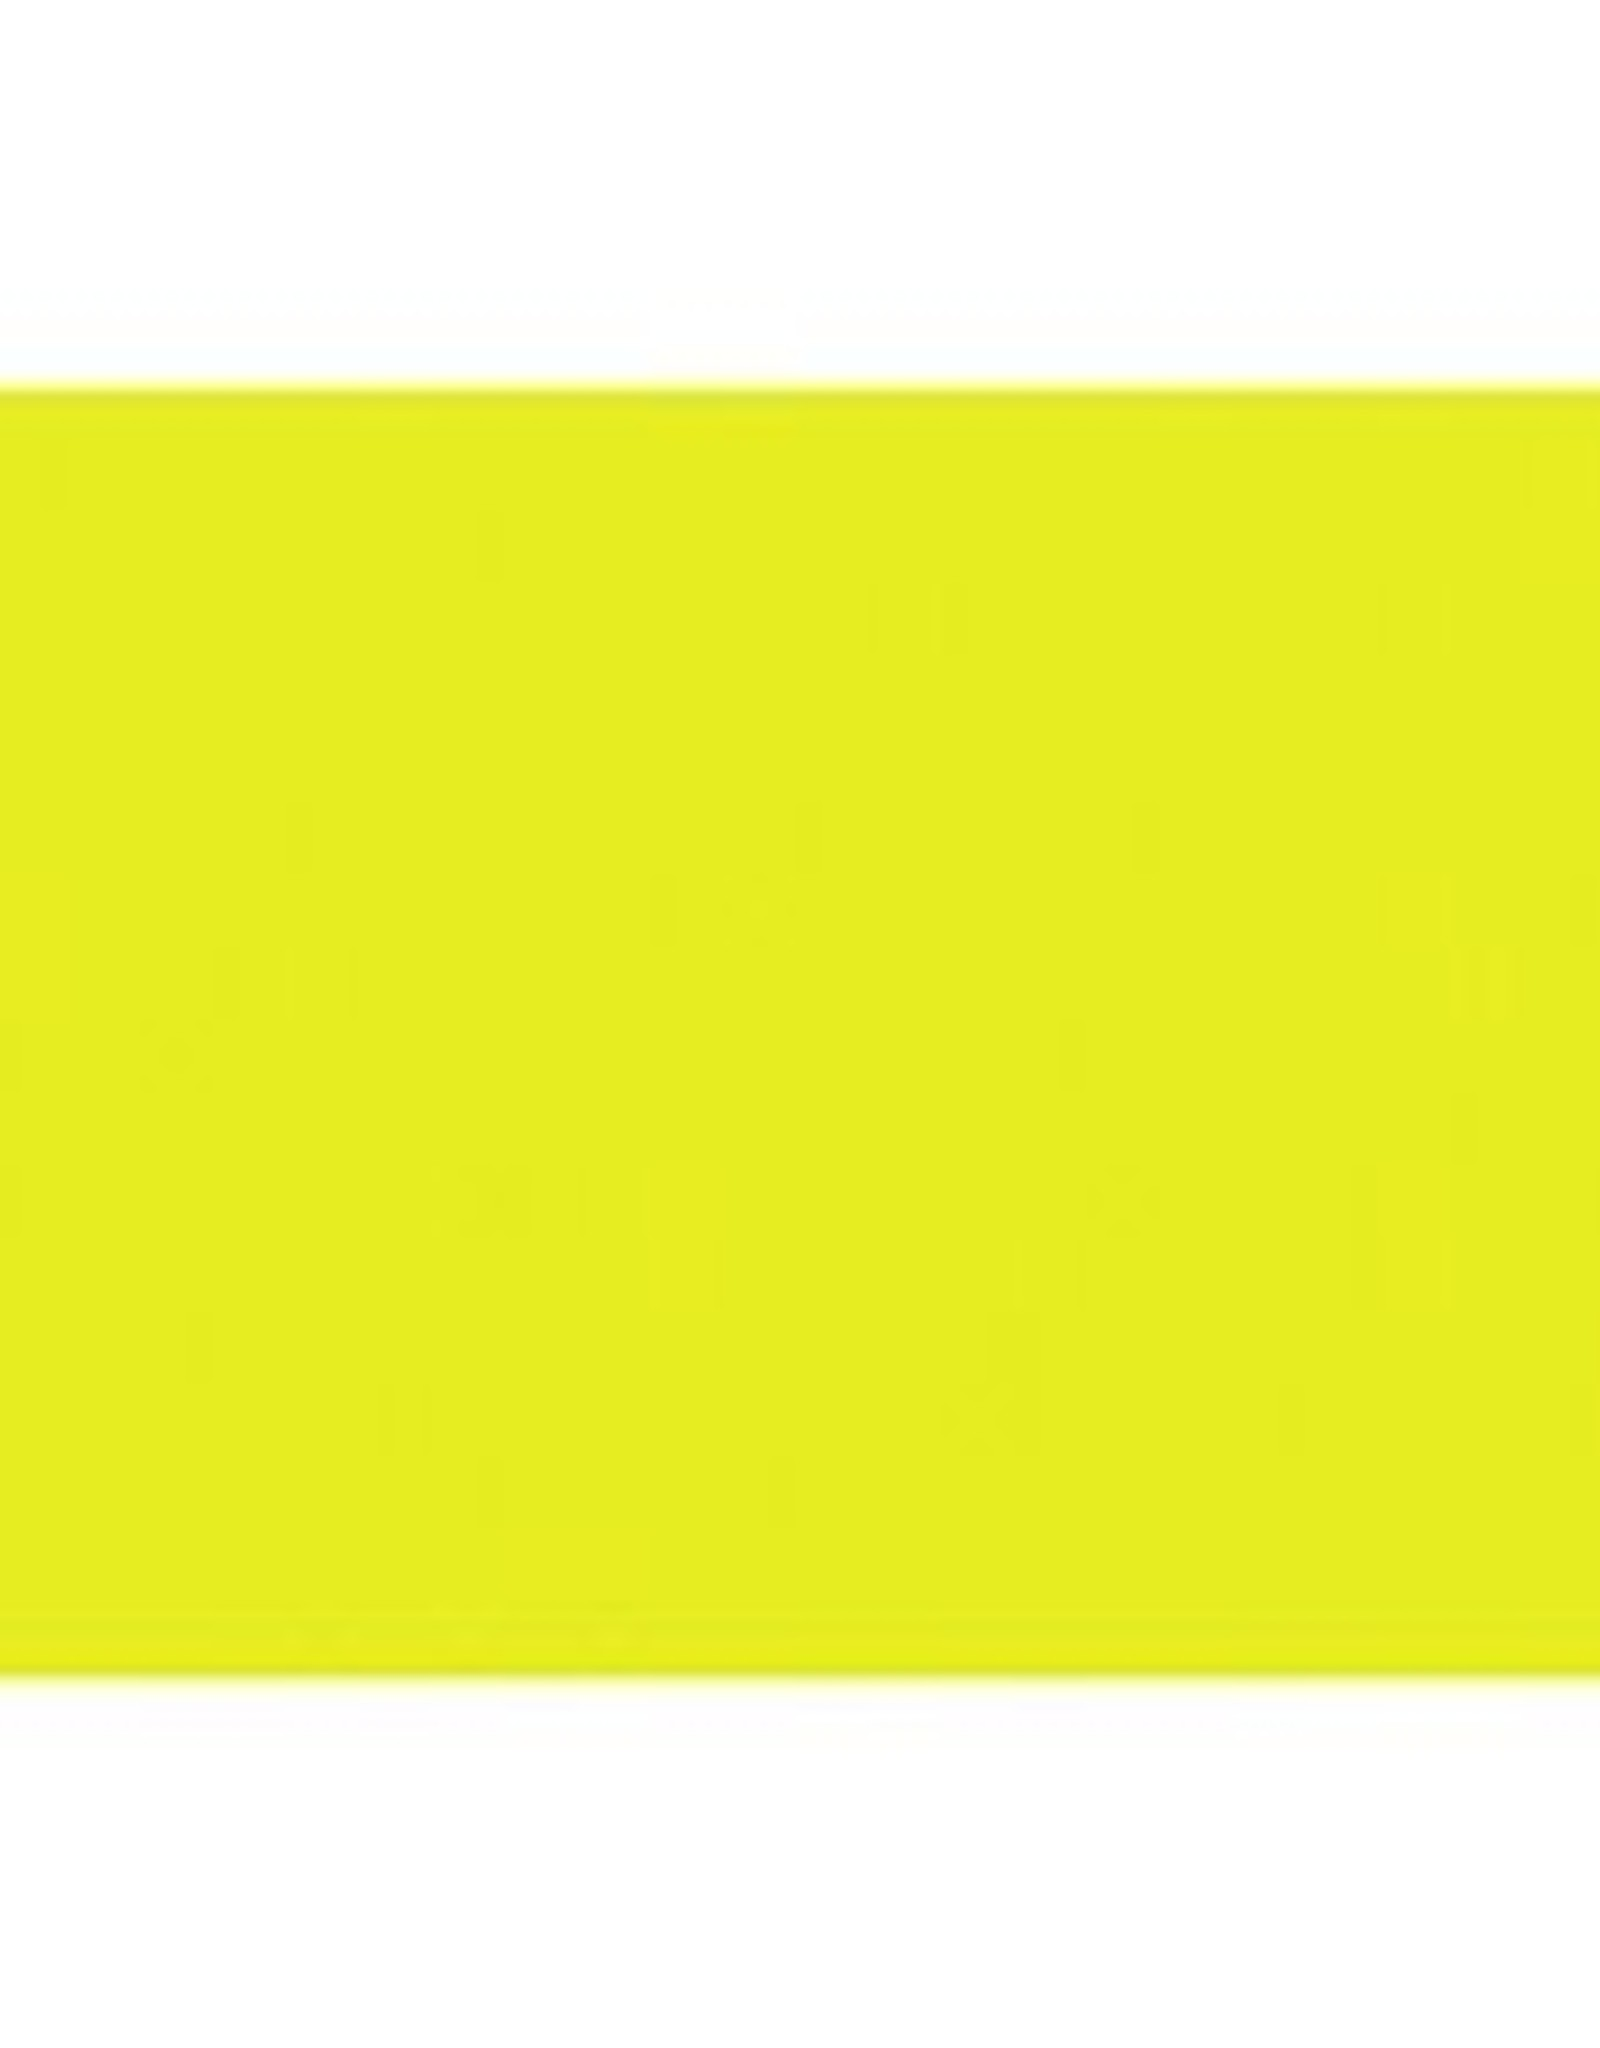 20 inches X 30 inches Fluorescent Yellow Foam Board